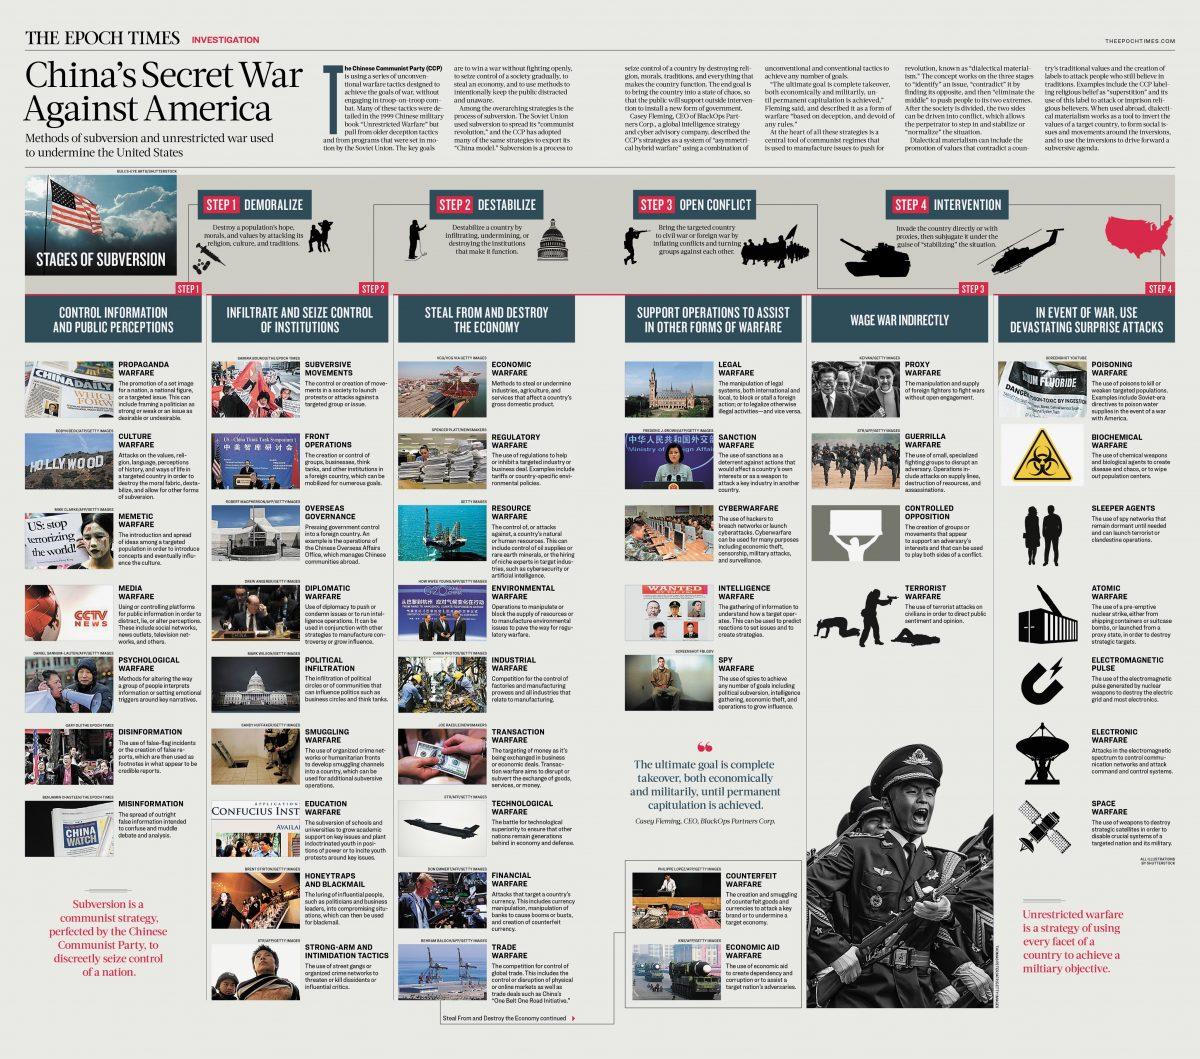 https://i1.wp.com/globaleconomicwarfare.com/wp-content/uploads/2018/03/Epoch-Times.jpg